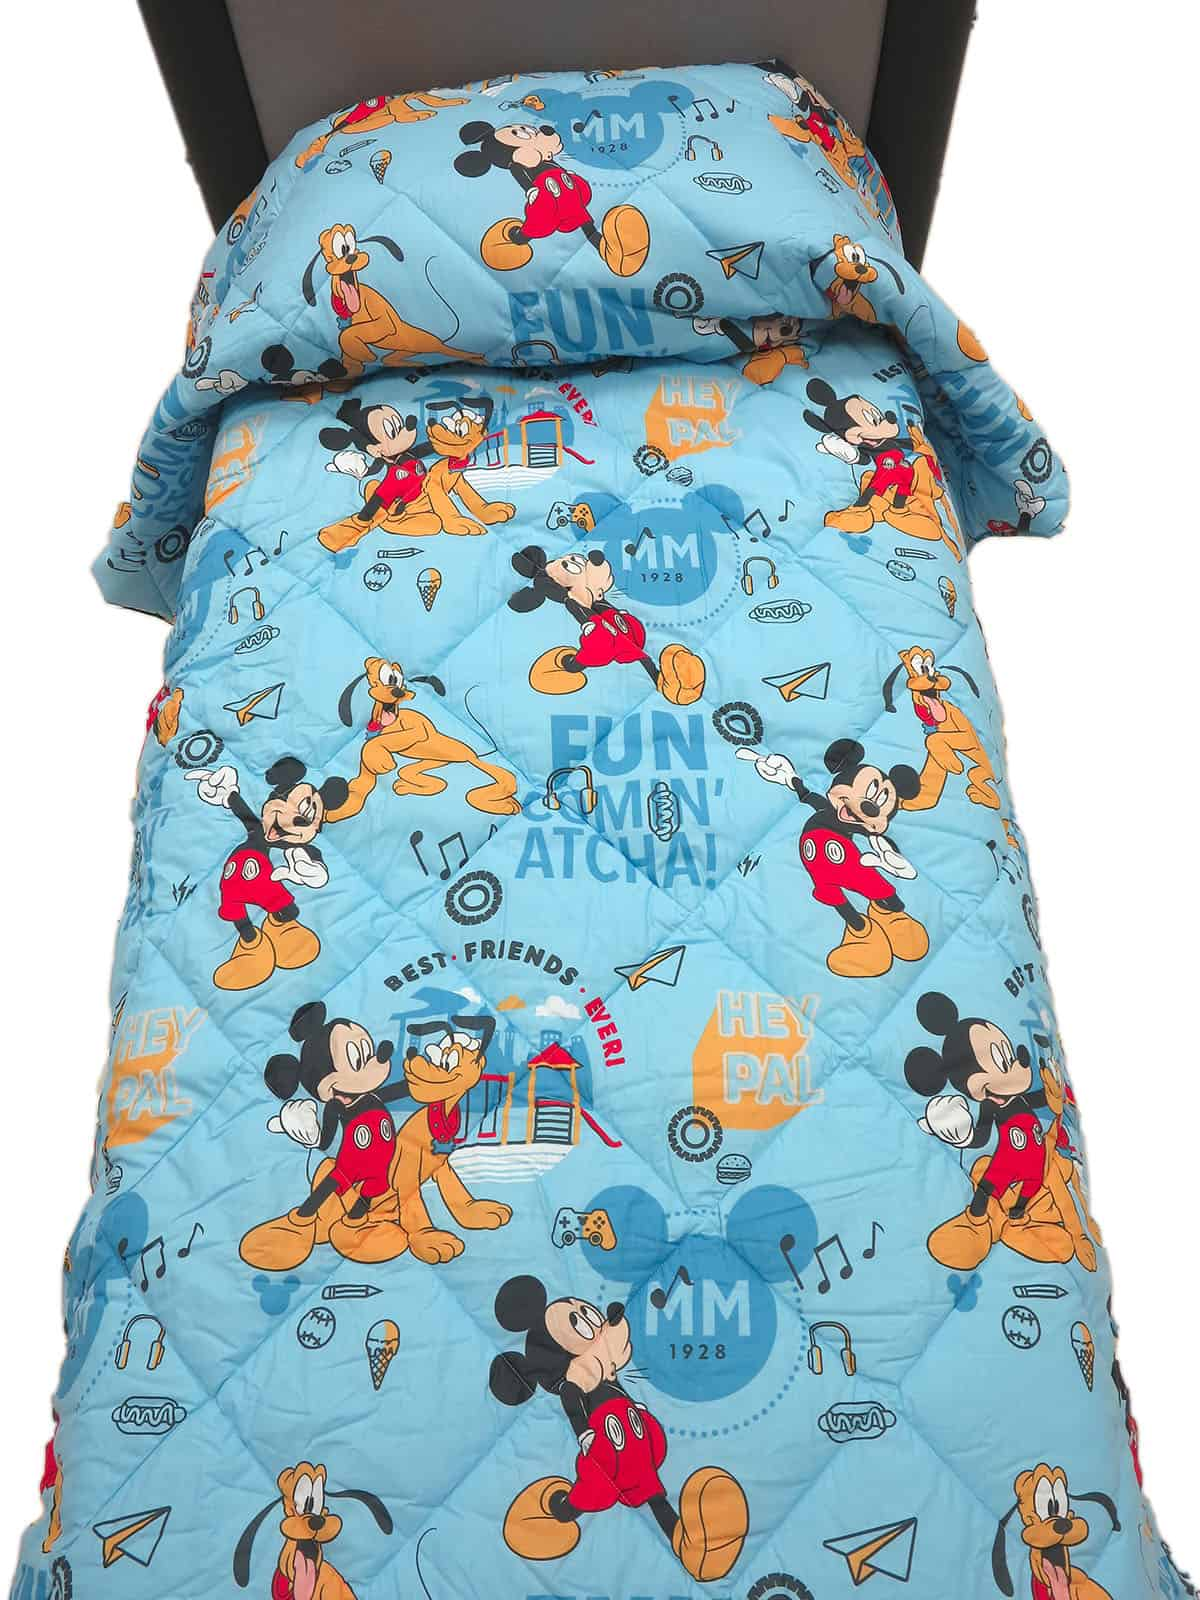 Trapunta Estiva Singola Disney.Trapunta Mickey Pluto Caleffi Singola Azzurro Tessuto Cotone